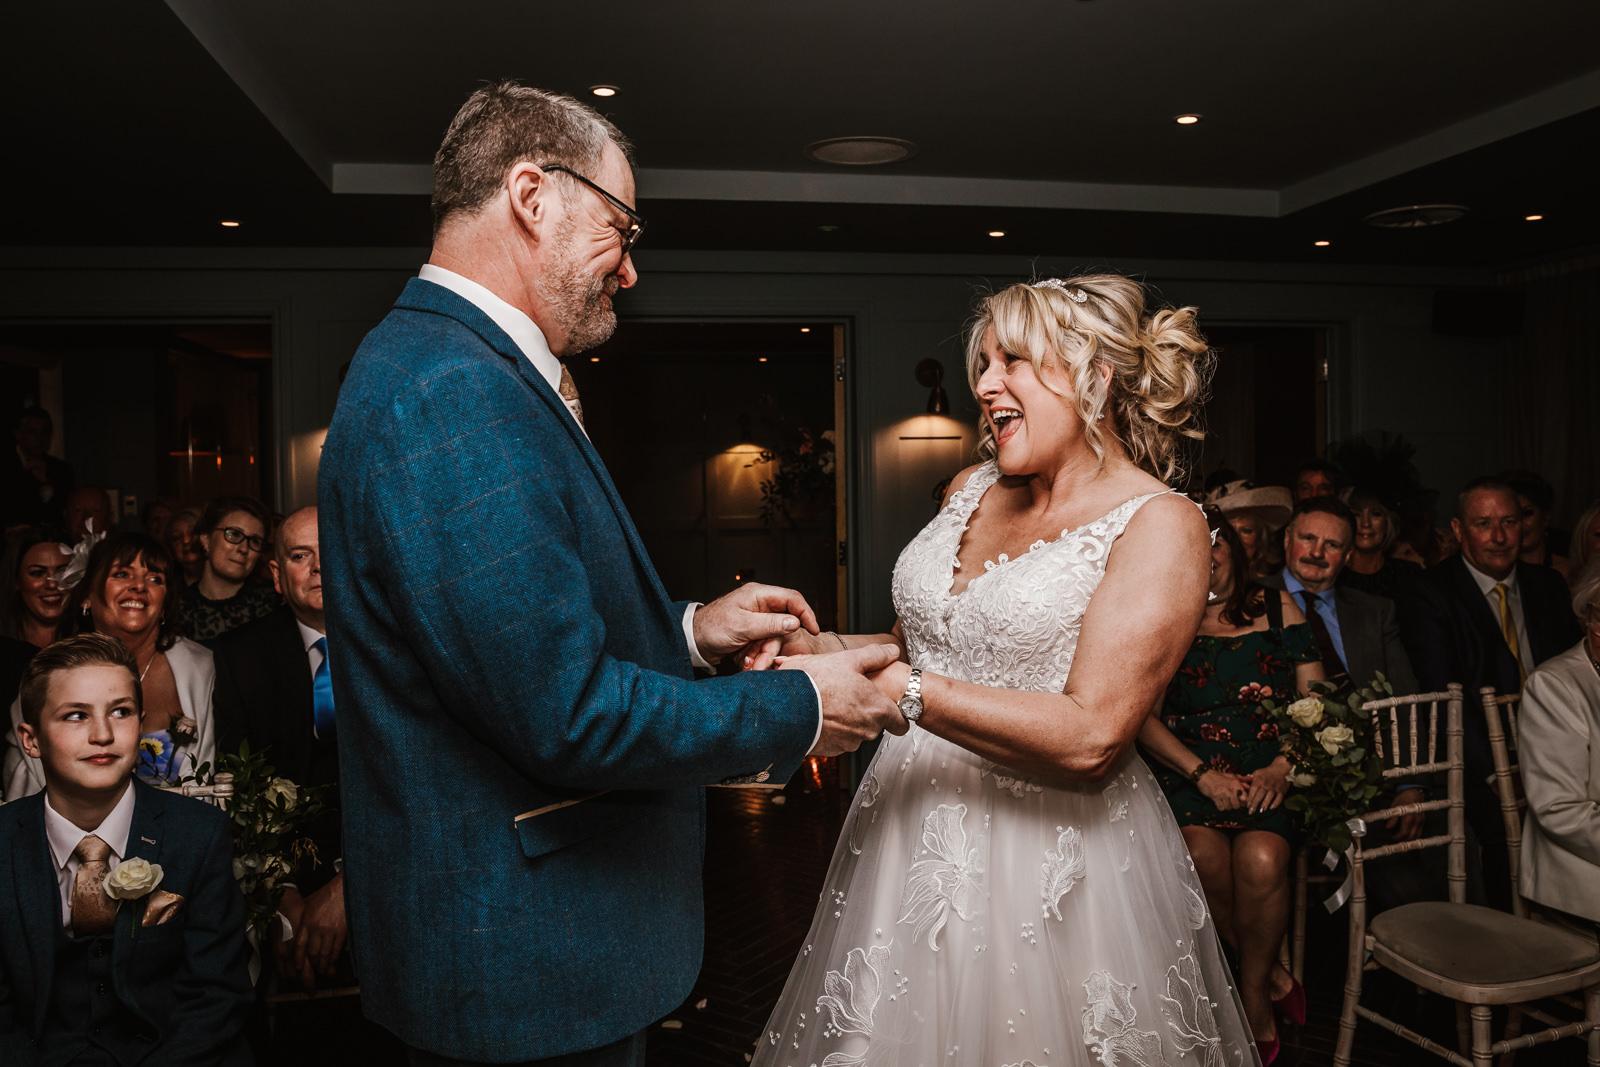 King street twonhouse wedding